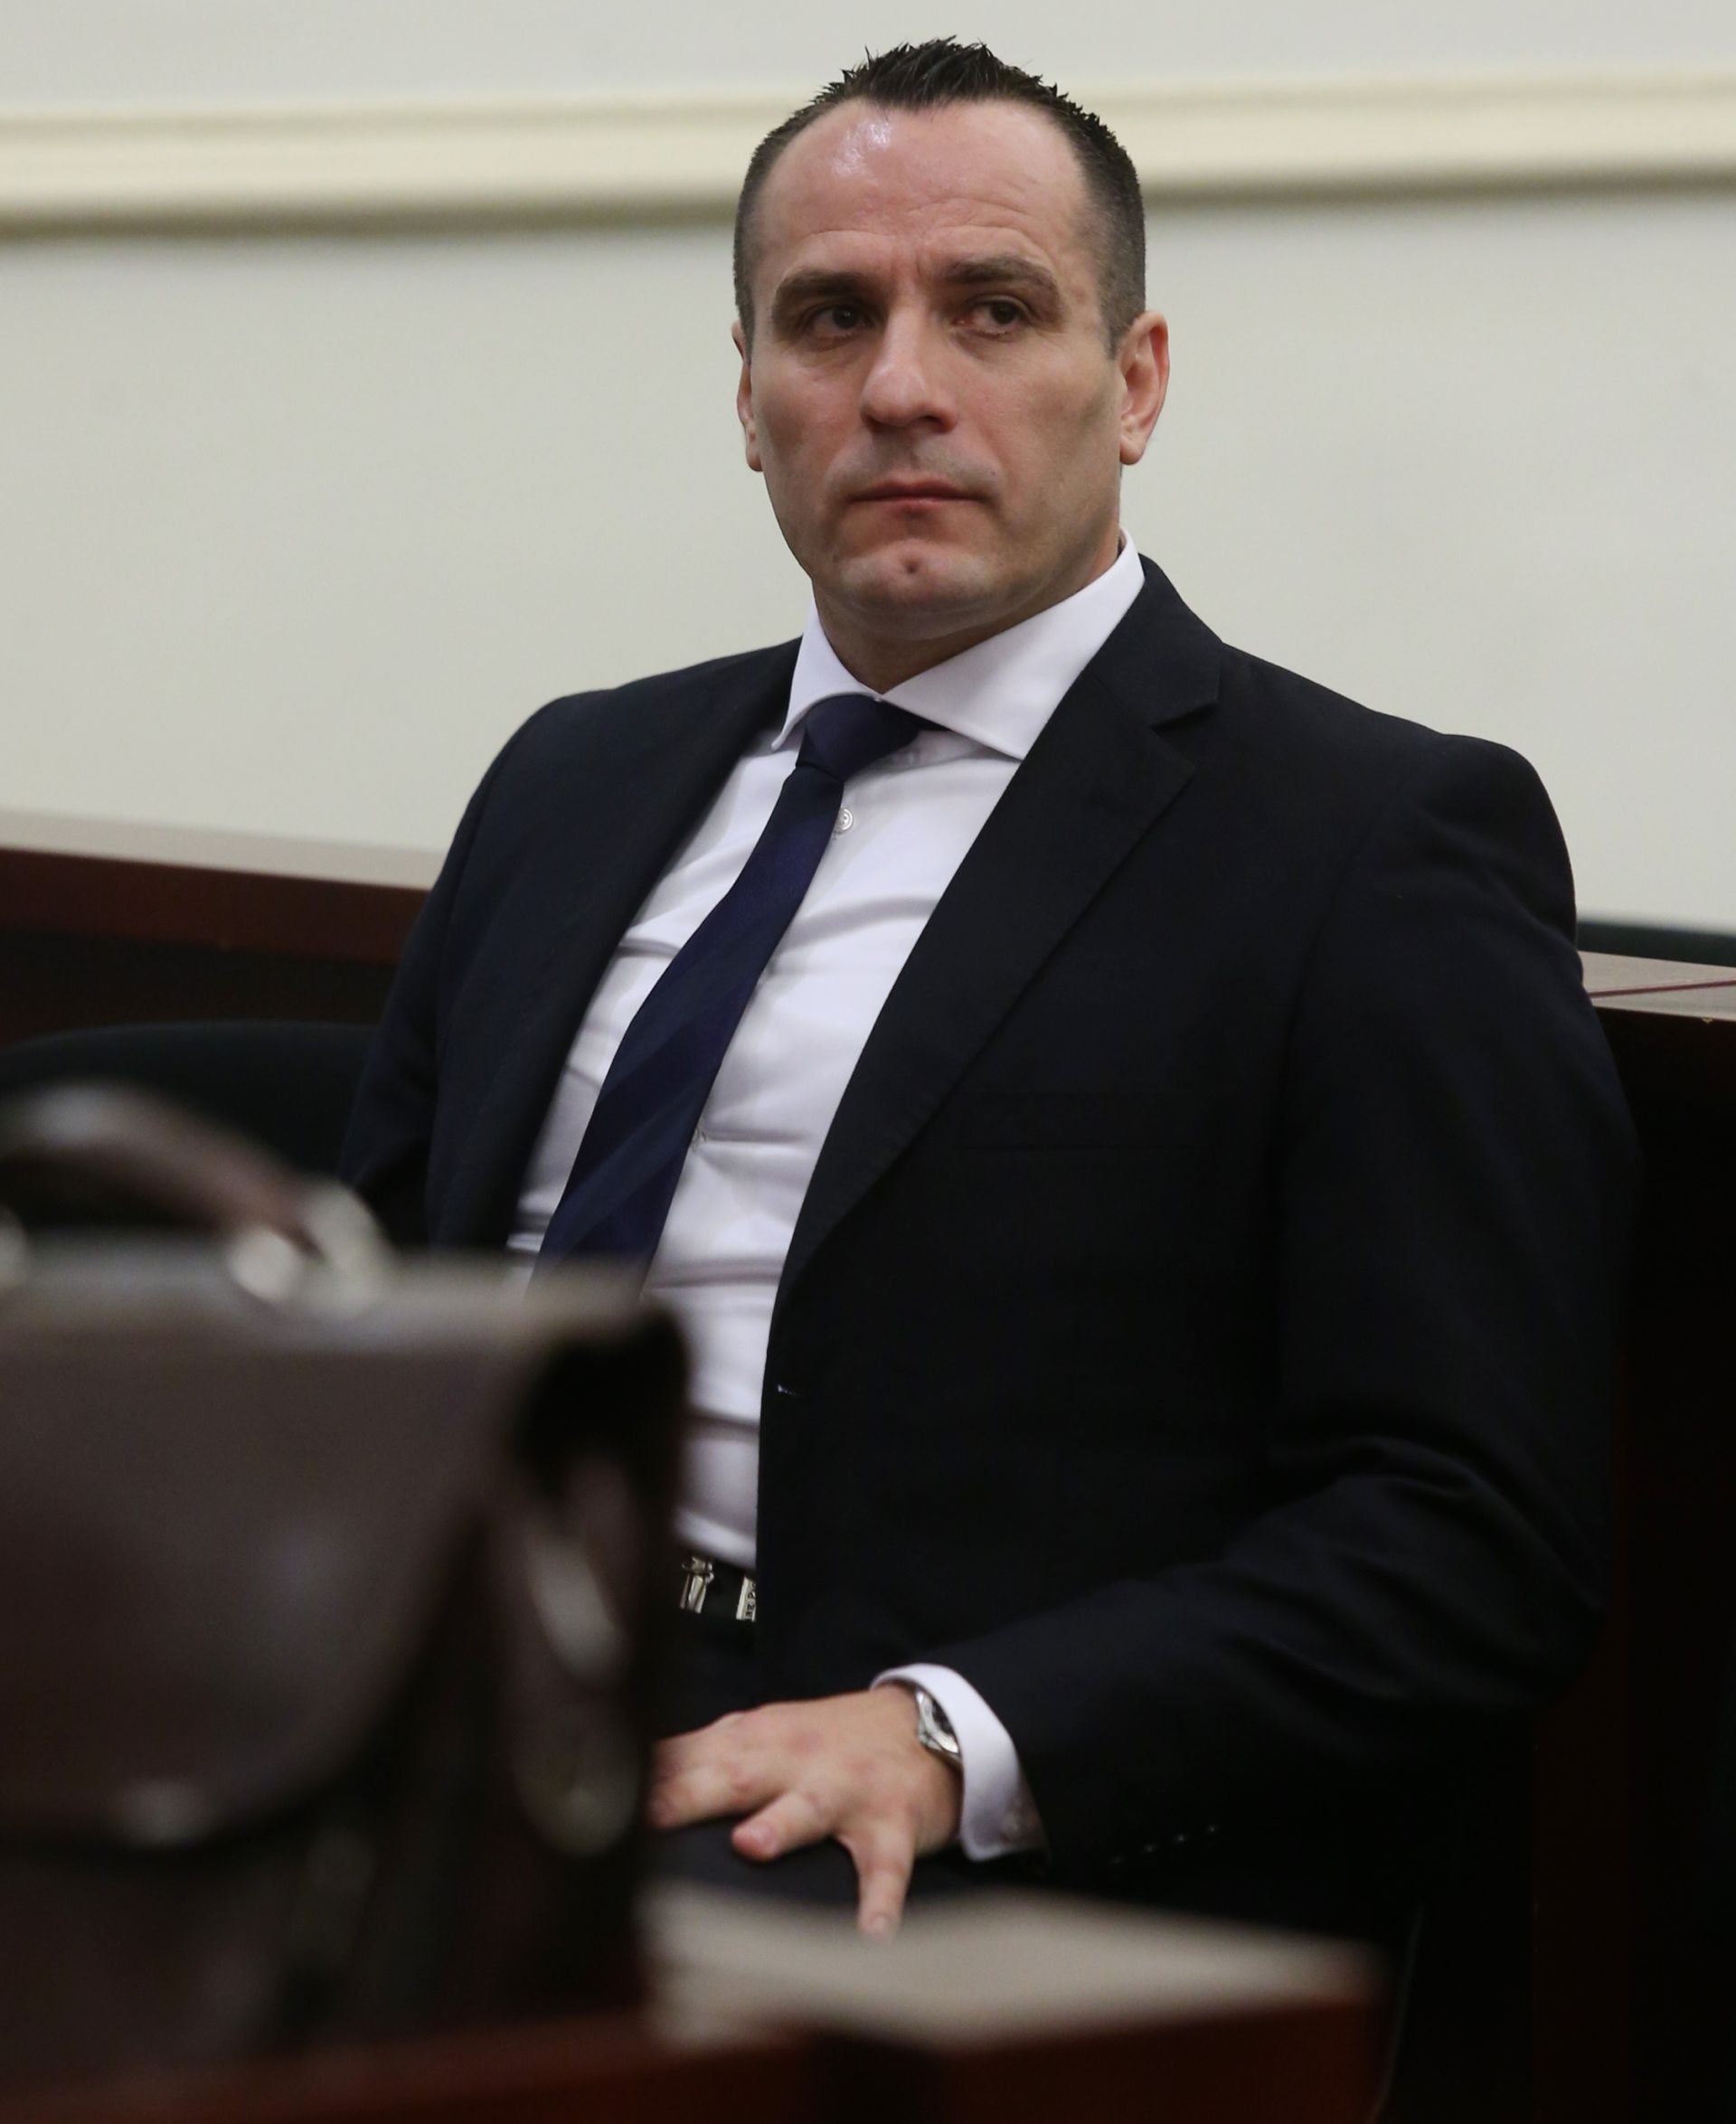 NOVI ČLAN TIMA VLAHE OREPIĆA: Bivši tjelohranitelj Ive Sanadera je novi zamjenik ministra unutarnjih poslova